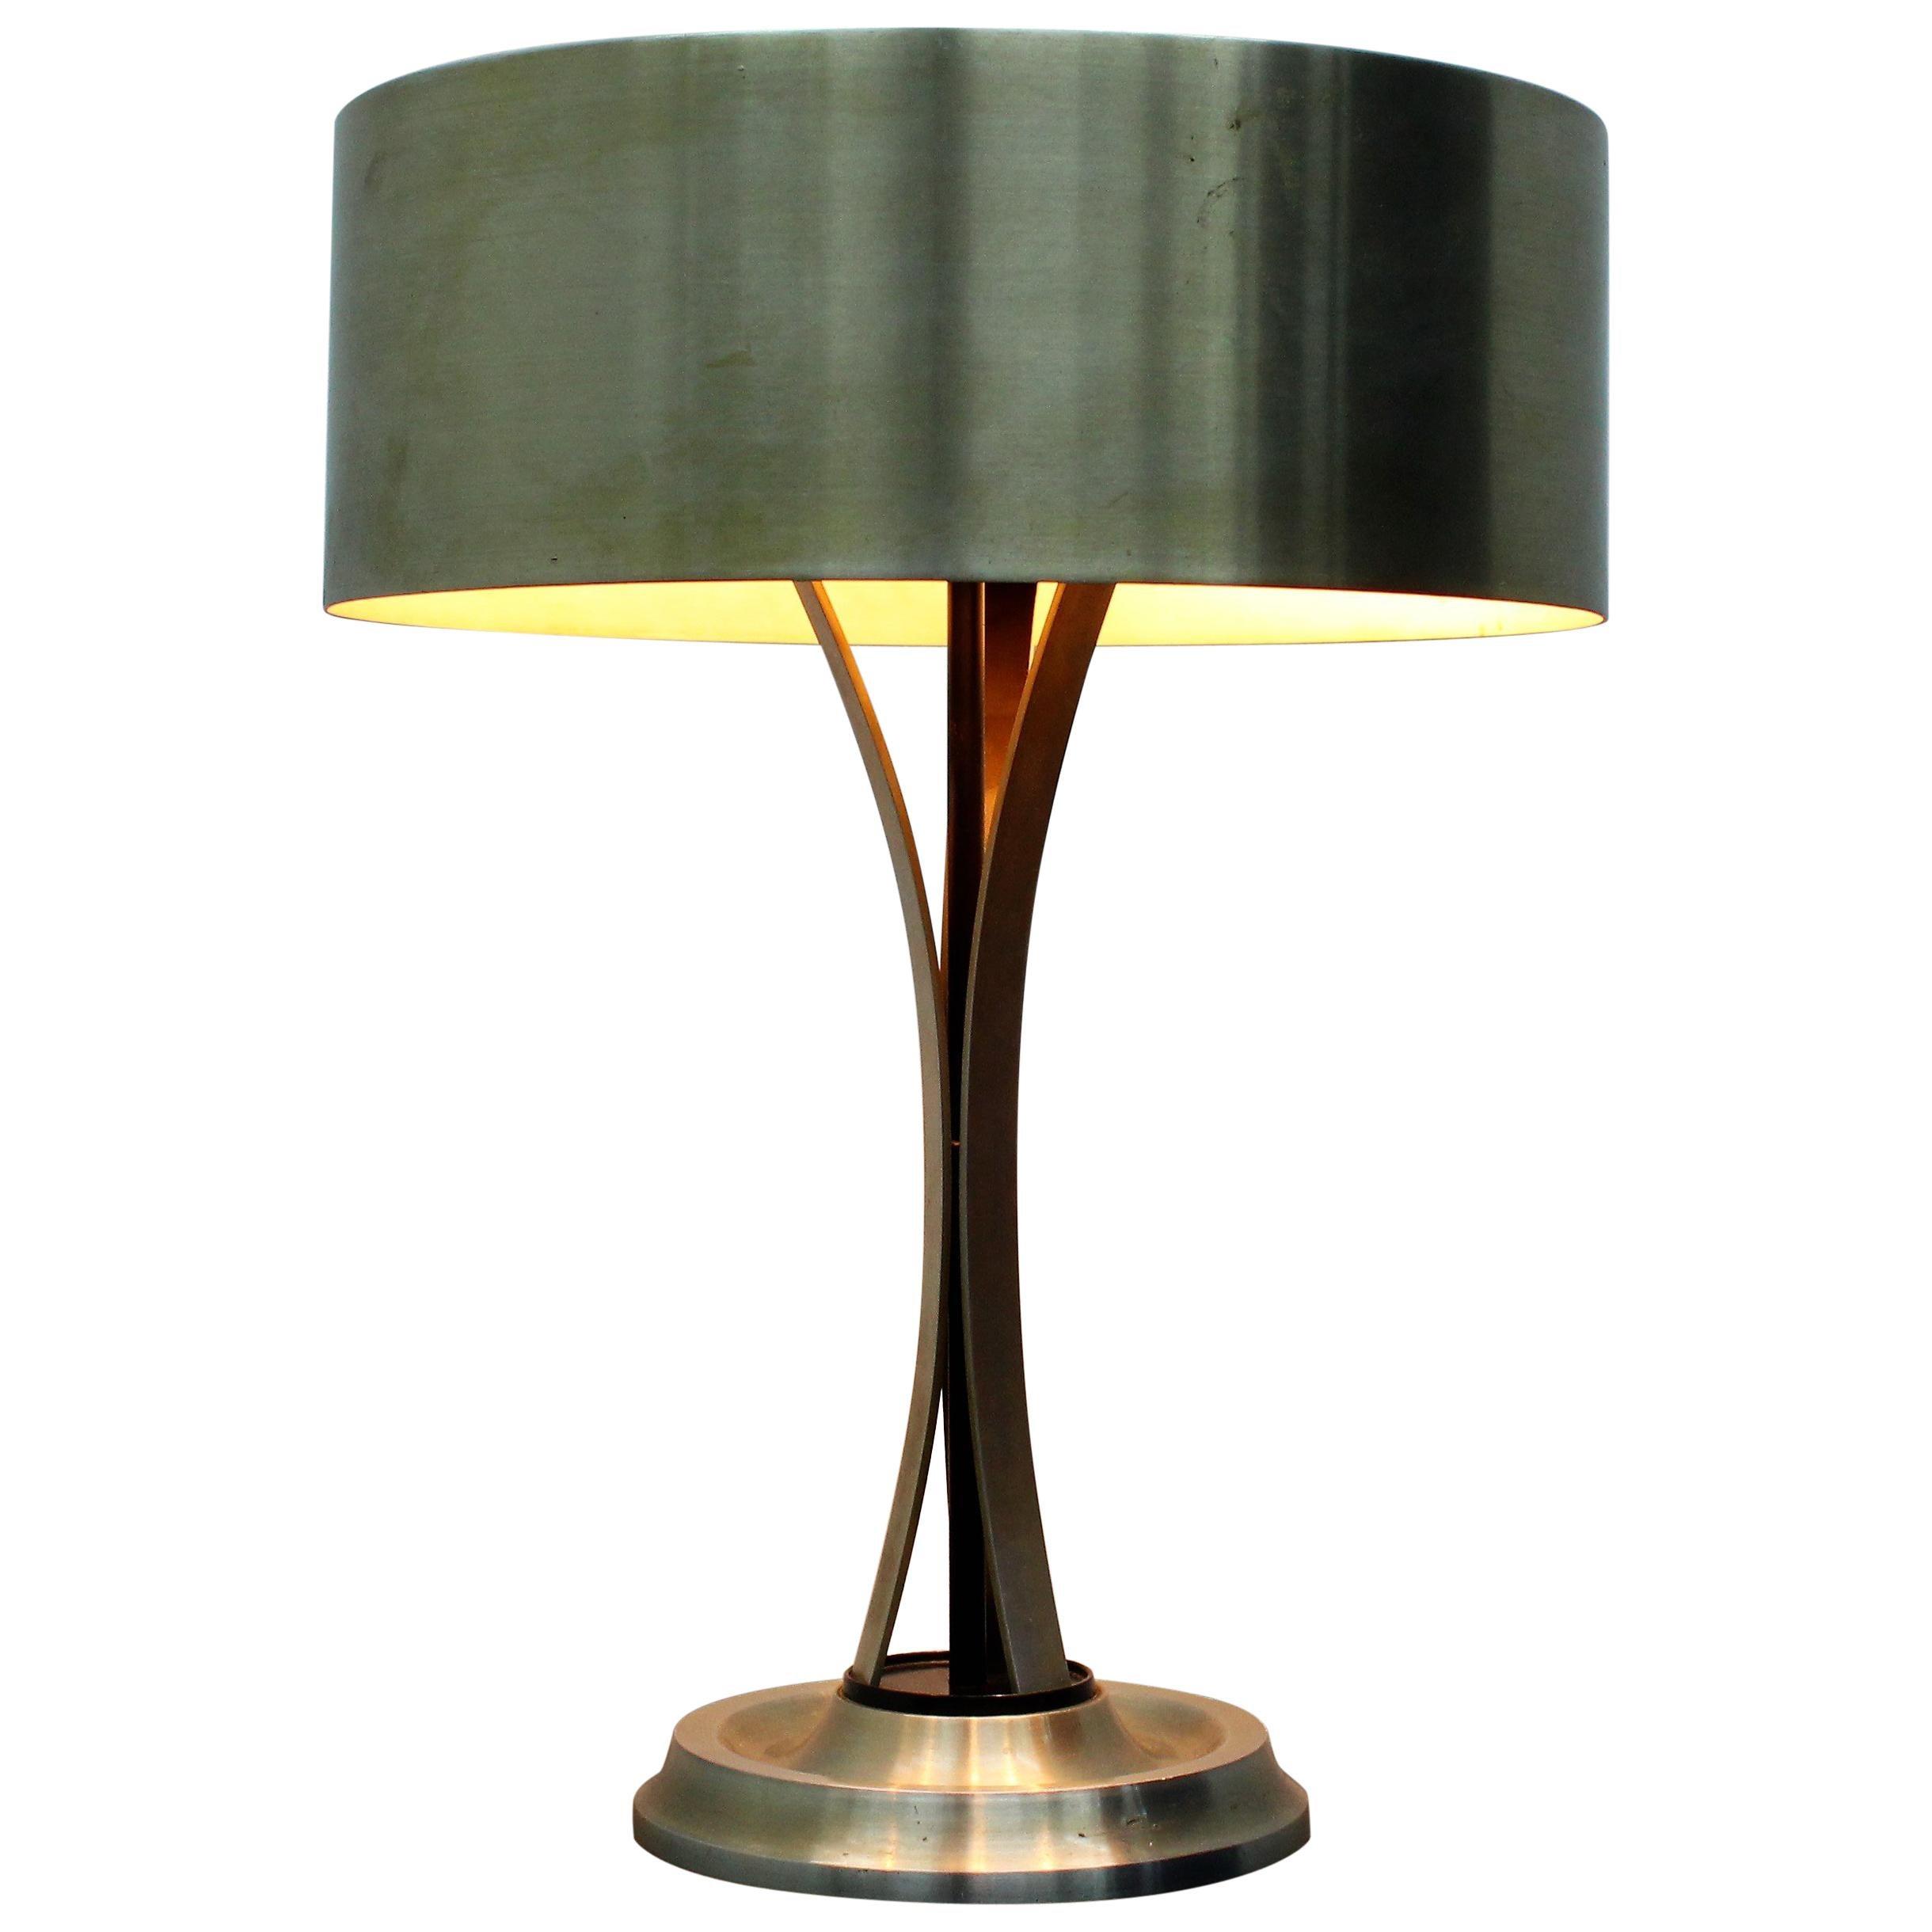 Oscar Torlasco Mid-Century Steel Table Lamp  Mod. 790 for LUMI Milano 1950